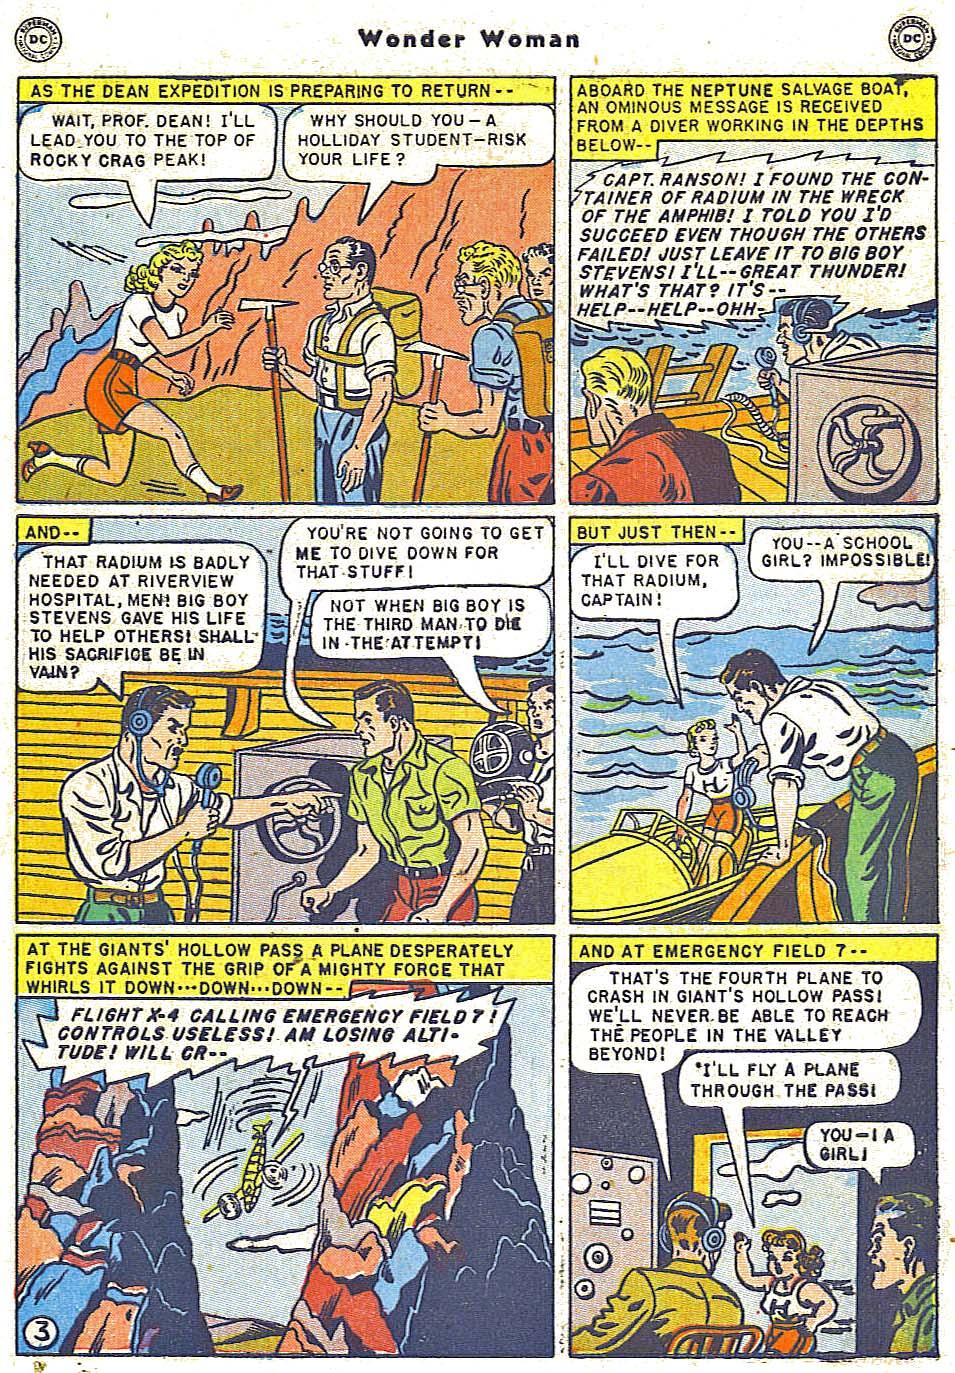 Read online Wonder Woman (1942) comic -  Issue #38 - 39